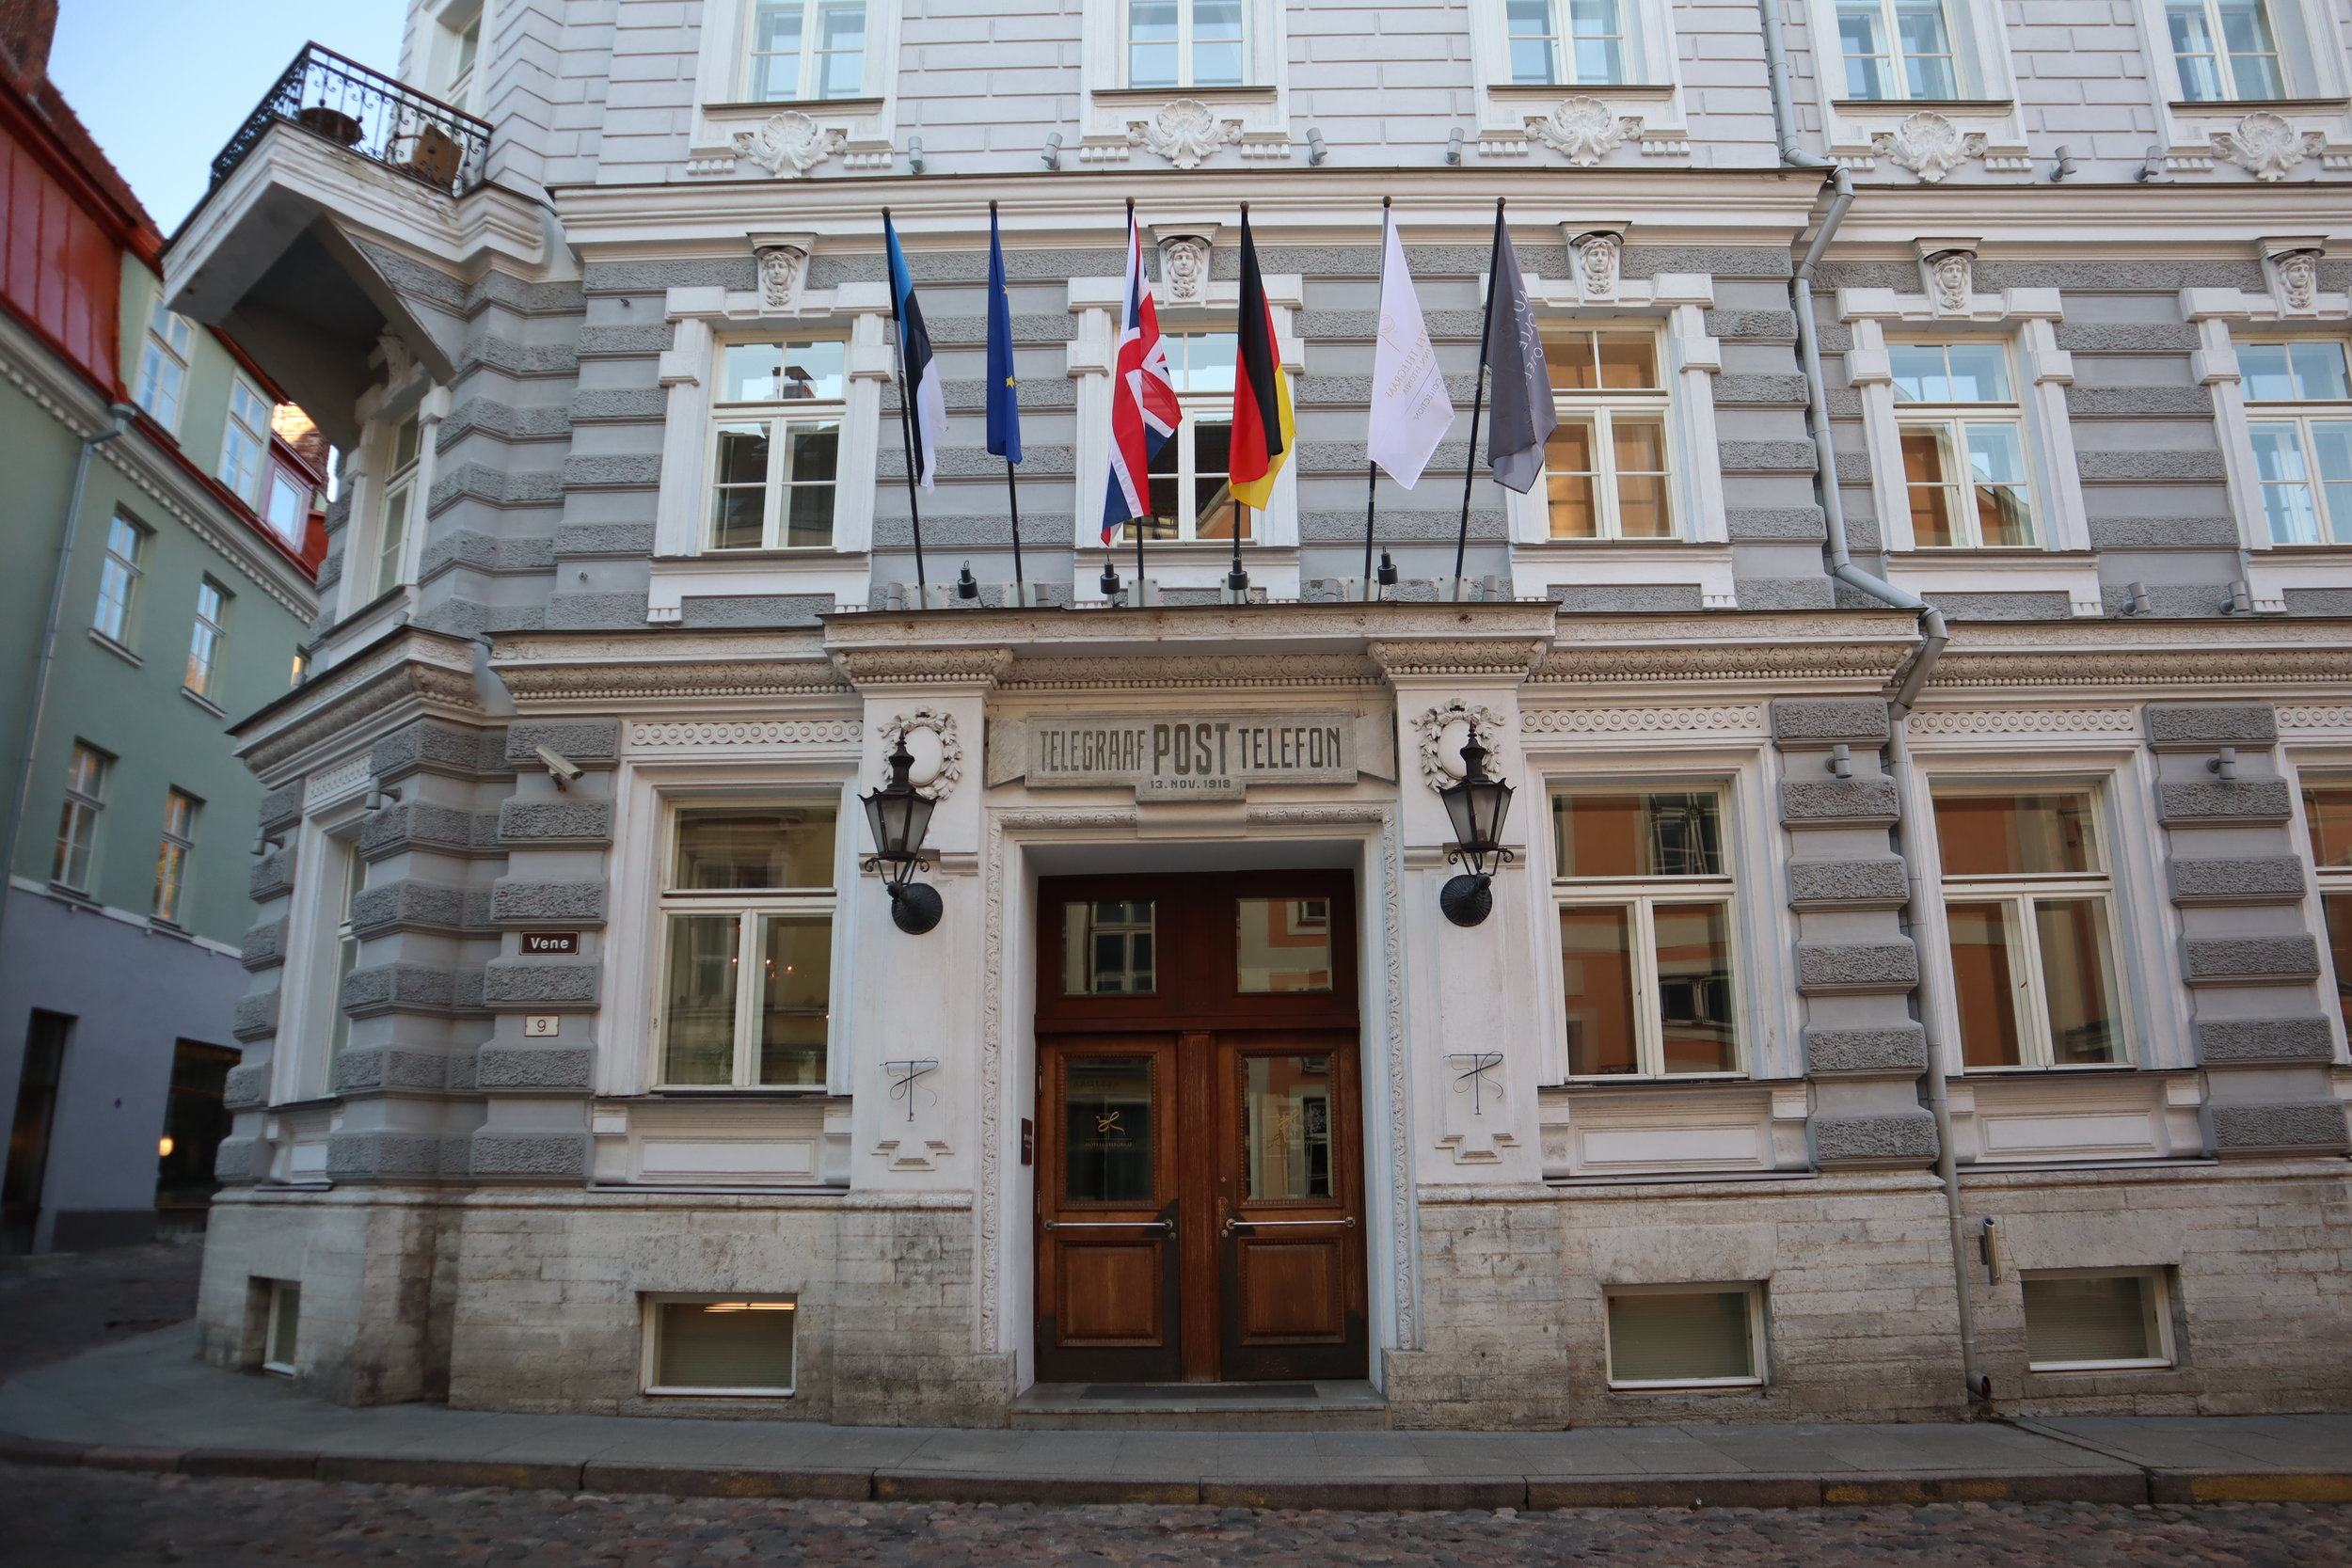 Hotel Telegraaf Tallinn – Exterior